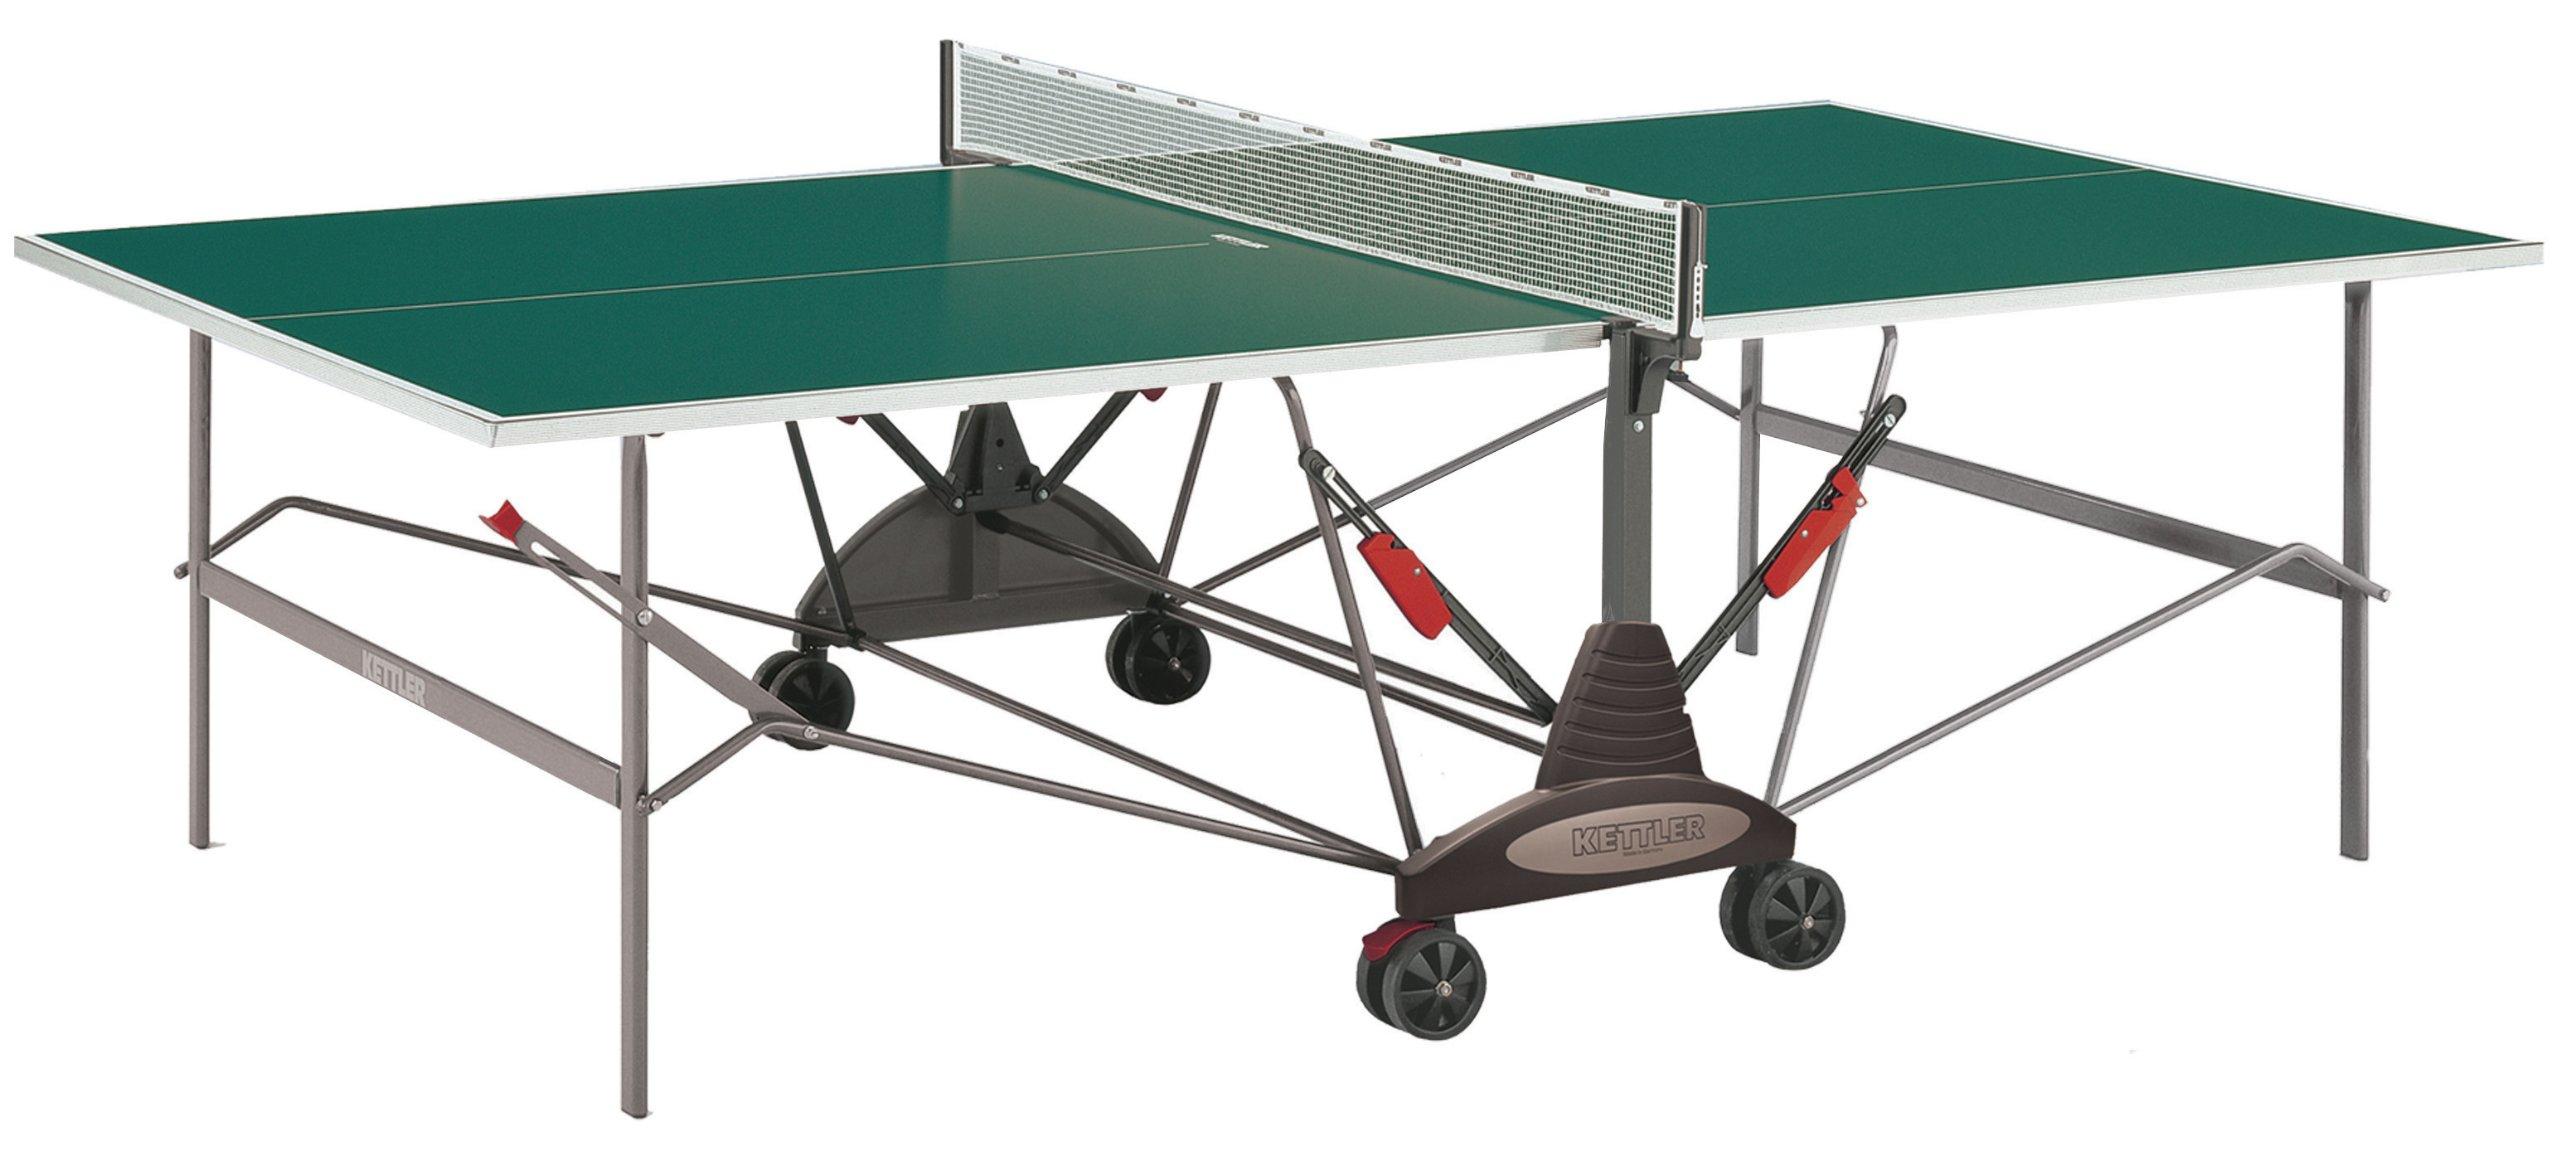 Kettler Stockholm GT Institutional/Tournament Indoor Table Tennis Table, Green Top